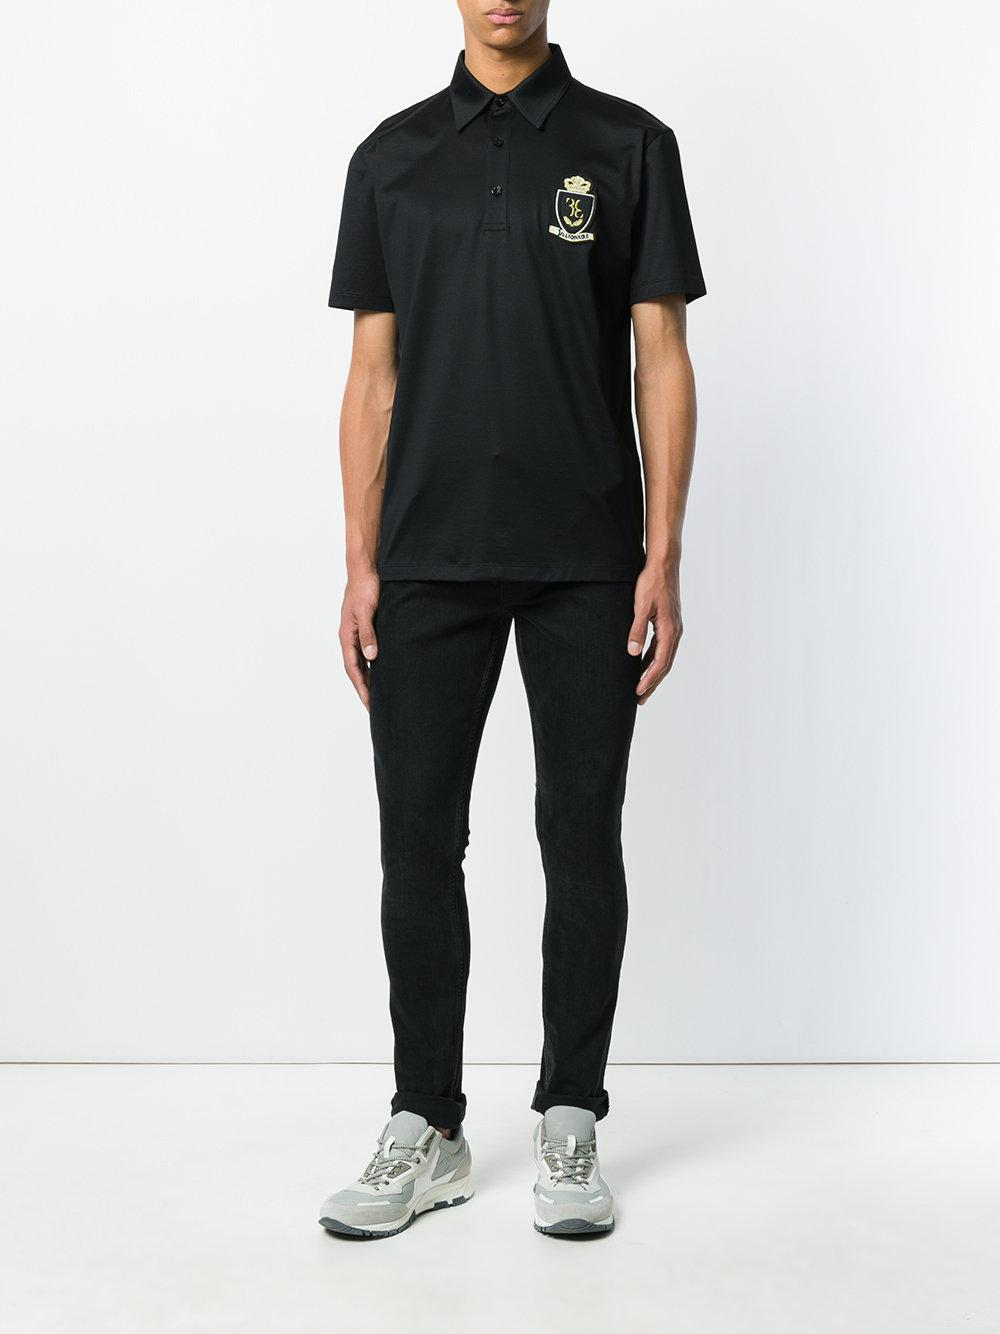 Billionaire Cotton Crest Polo Shirt in Black for Men